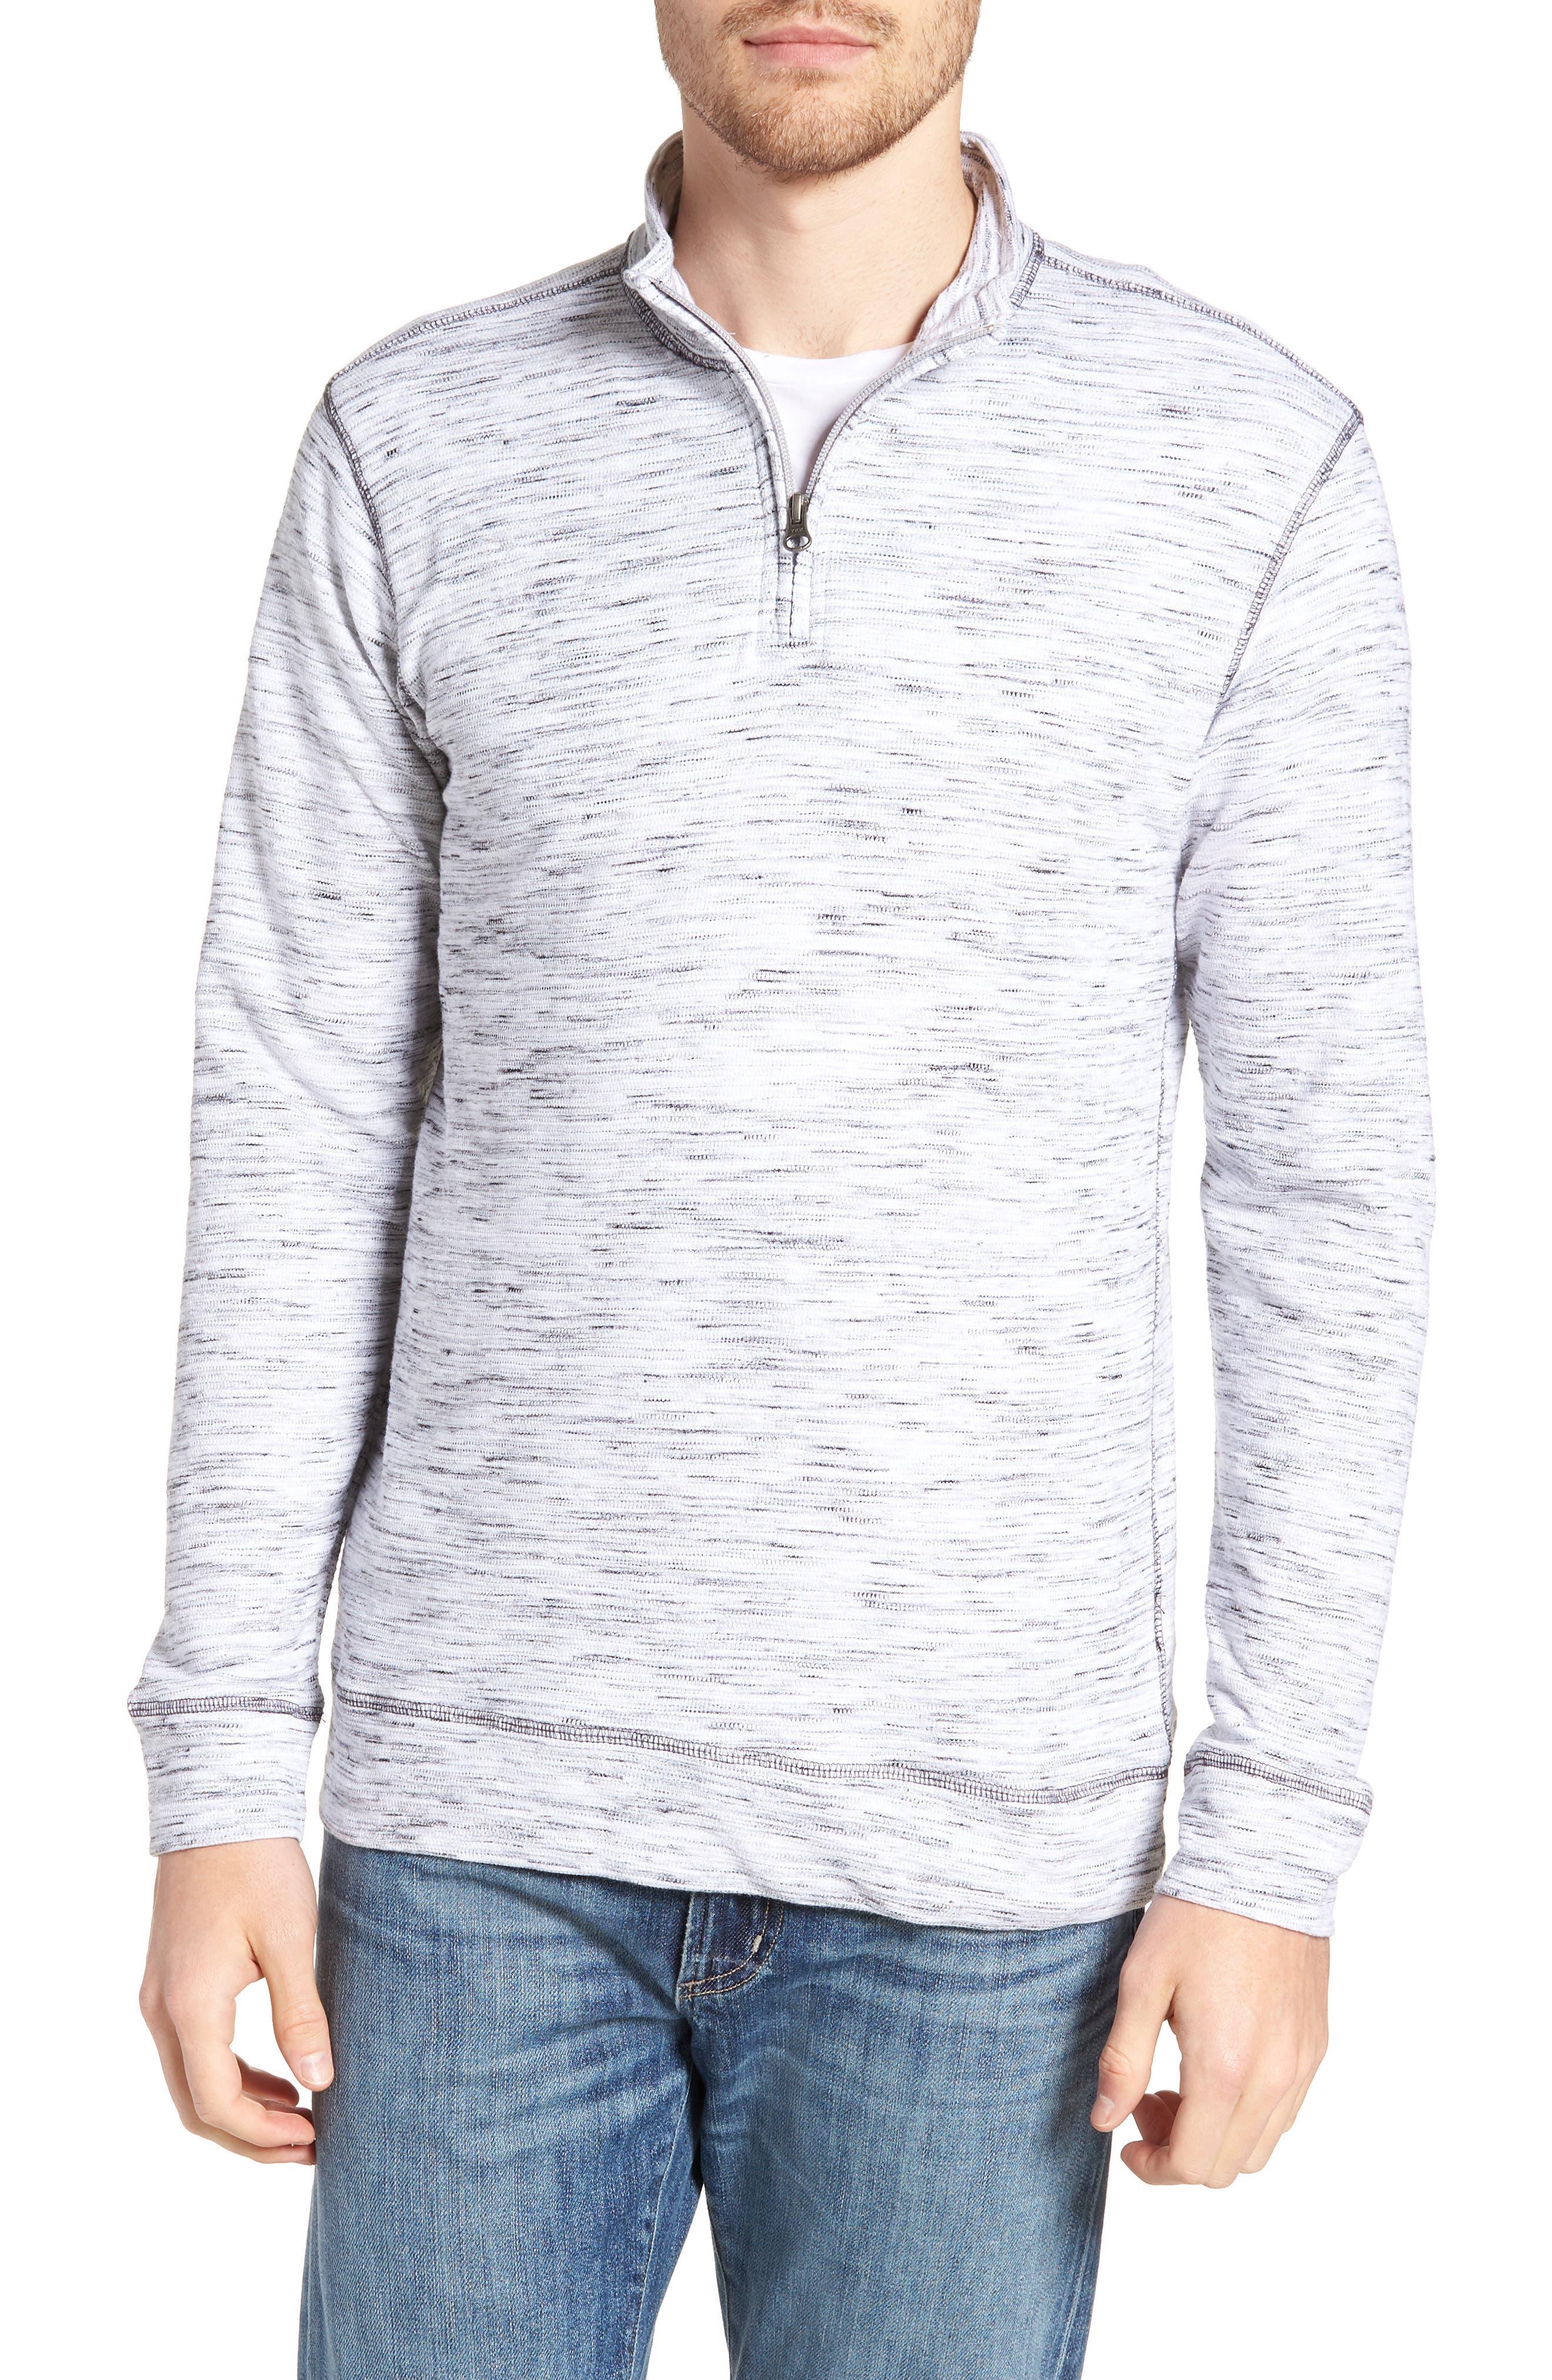 Regular Fit Jacquard Quarter Zip Shirt,                             Main thumbnail 1, color,                             270